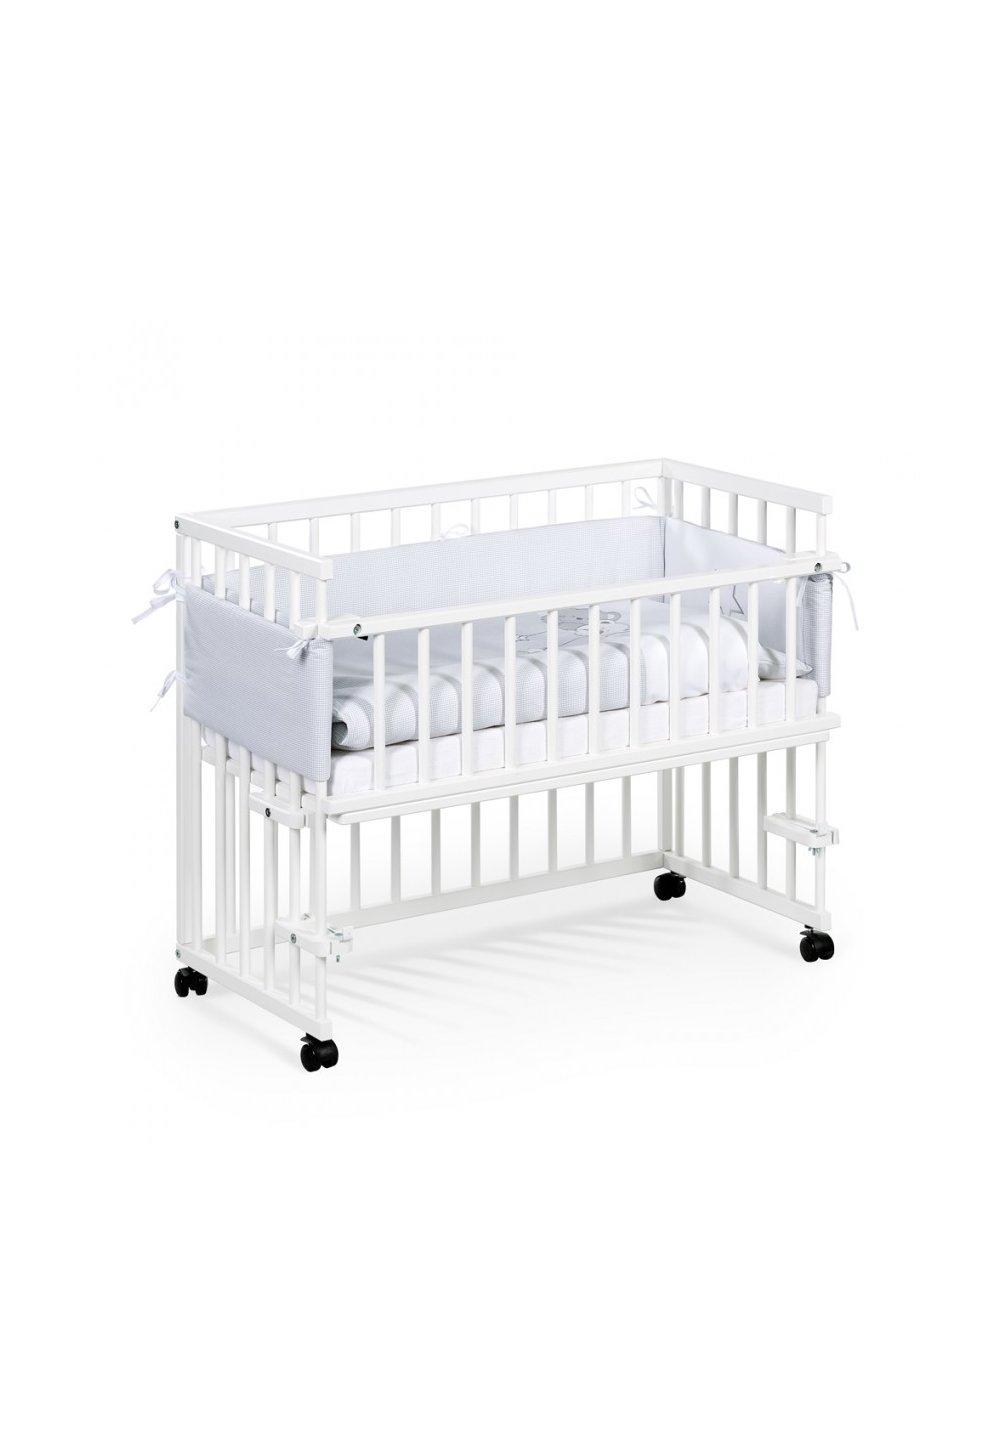 Patut bebe, lemn, Piccolo, alb, 95x45cm imagine